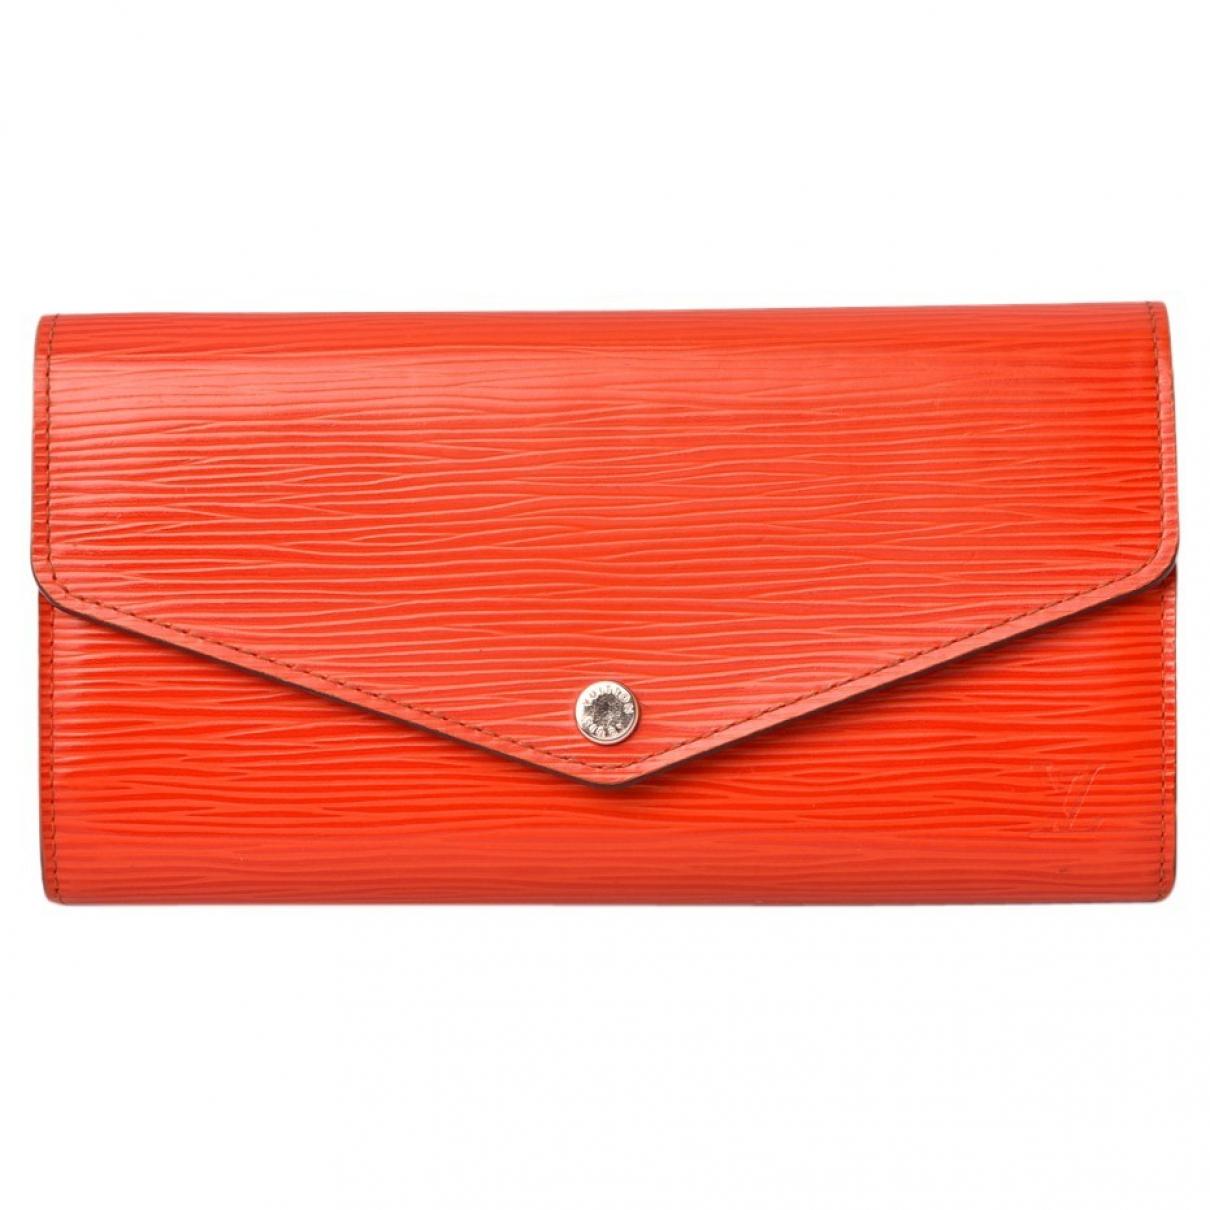 Louis Vuitton Sarah Orange Leather wallet for Women \N